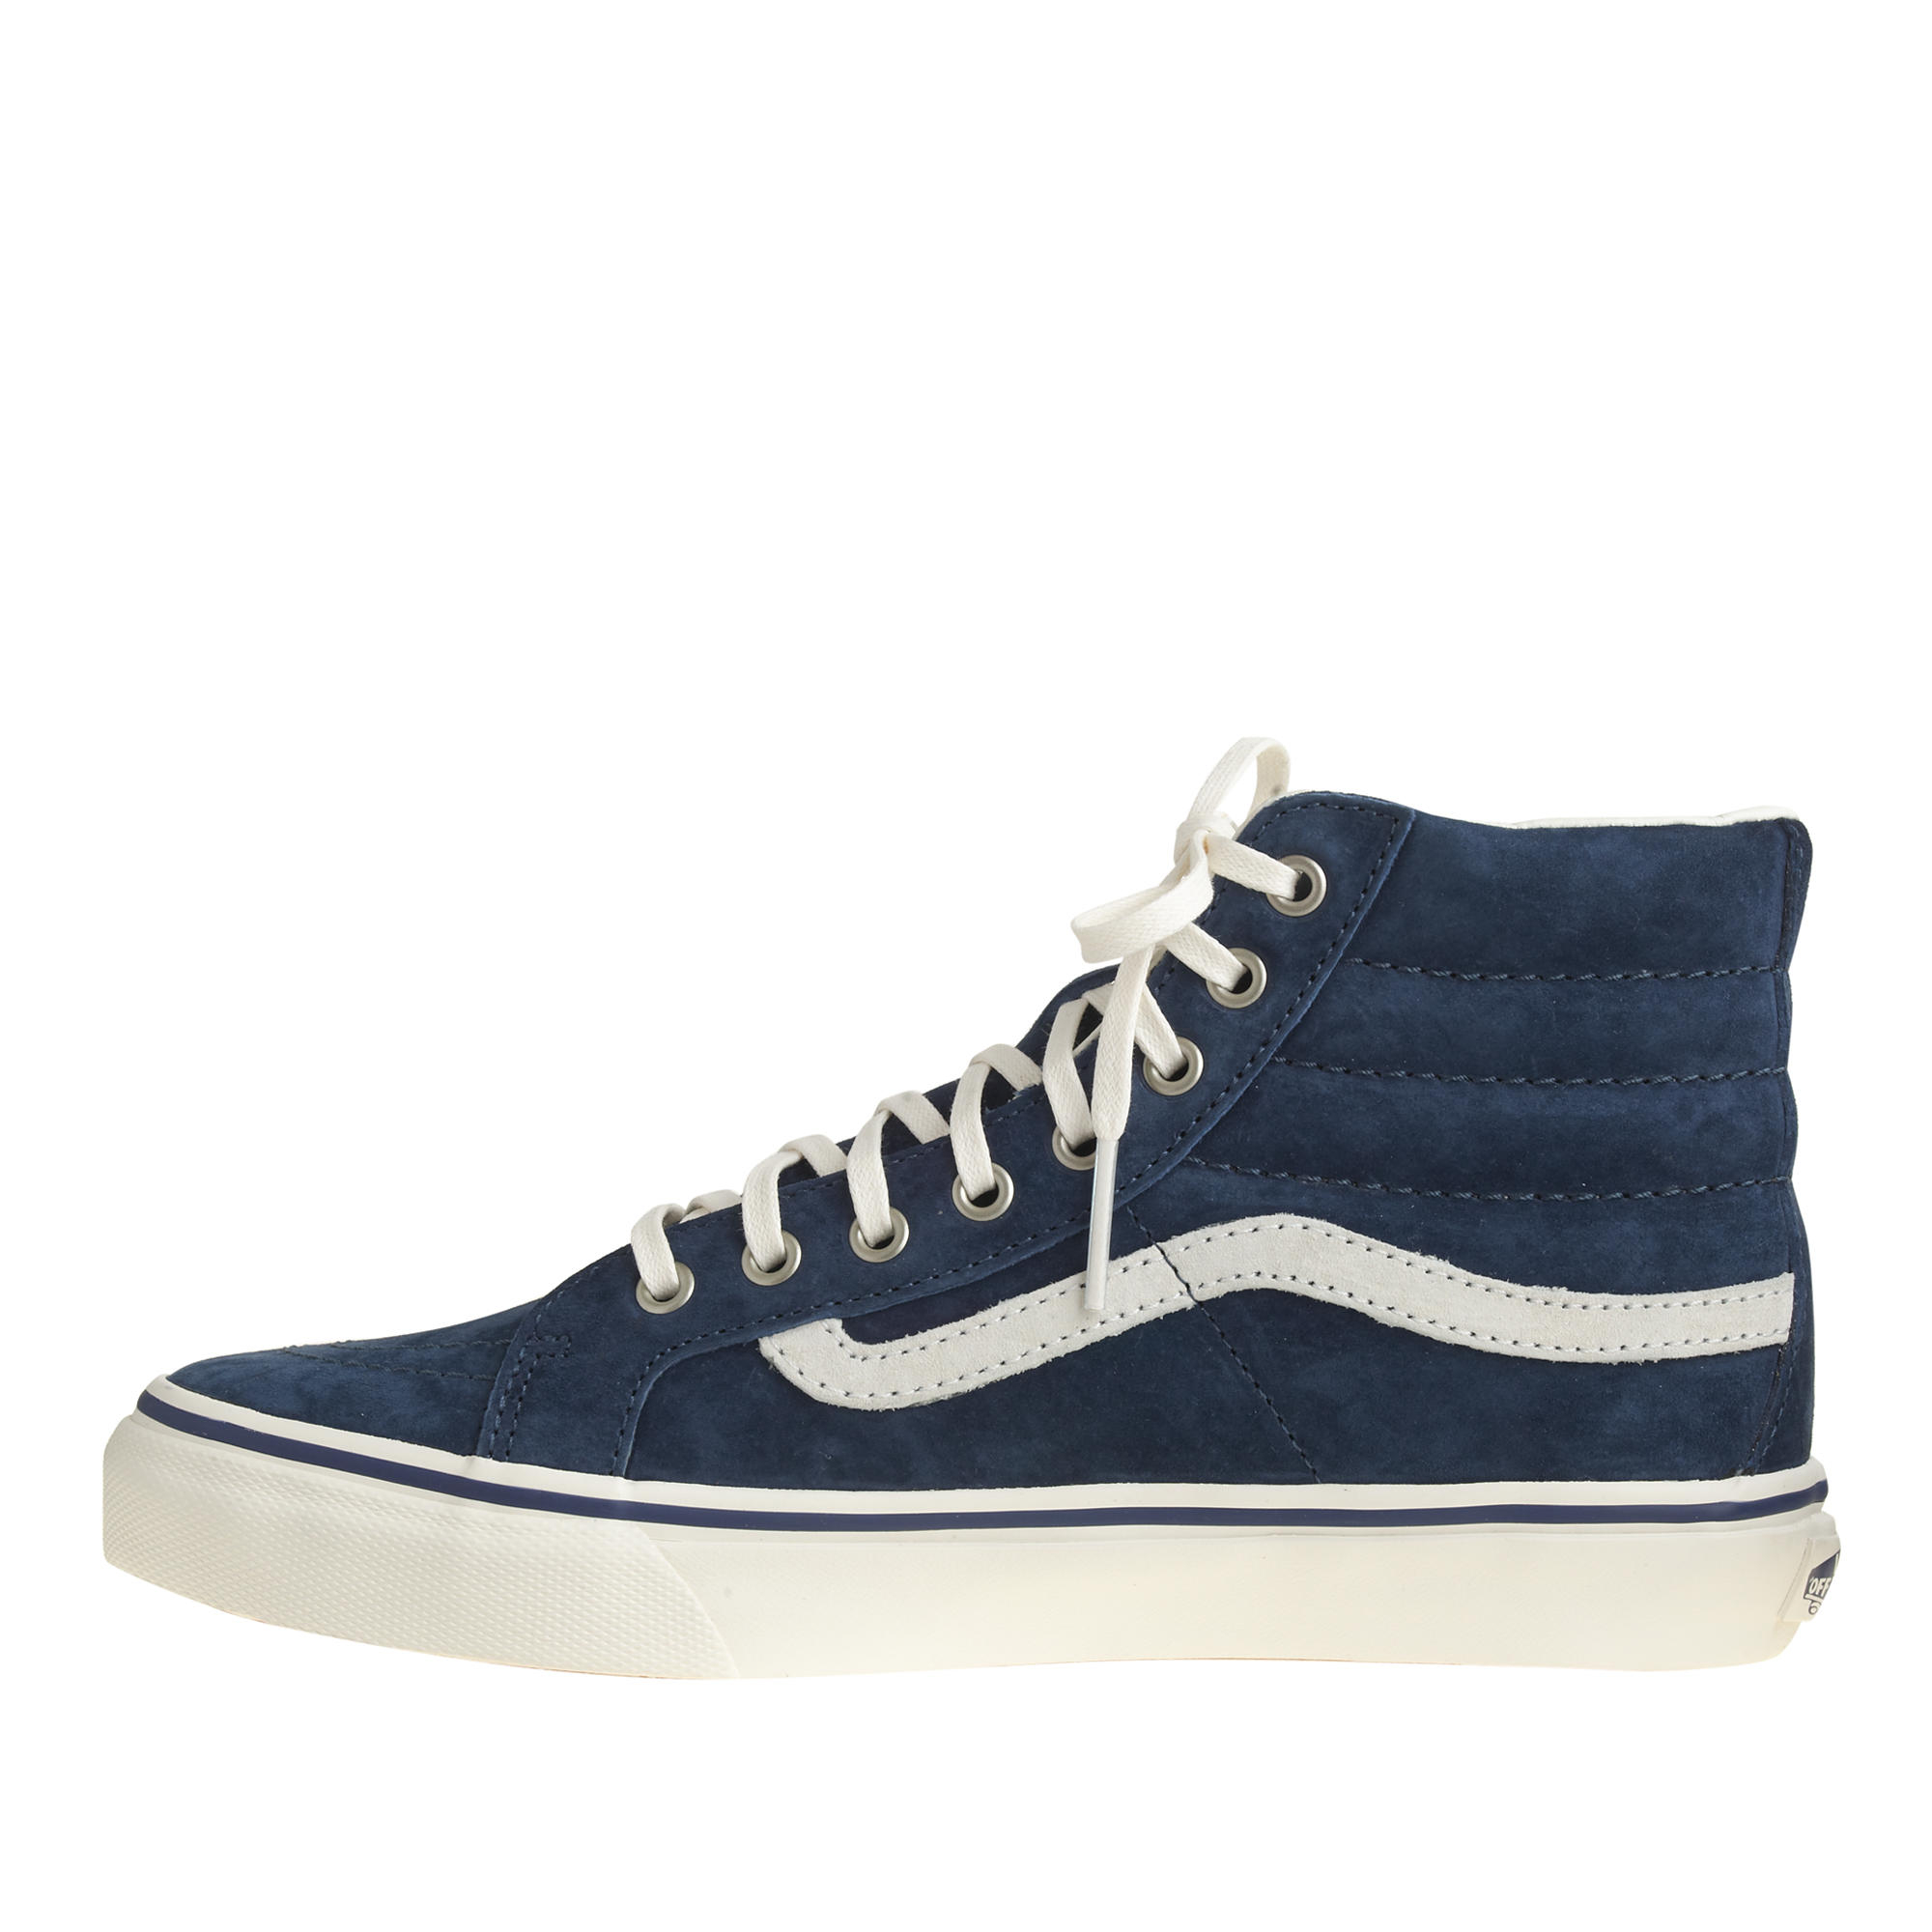 f41dfec938c160 Lyst - J.Crew Unisex Vans Sk8-hi Sneakers in Blue